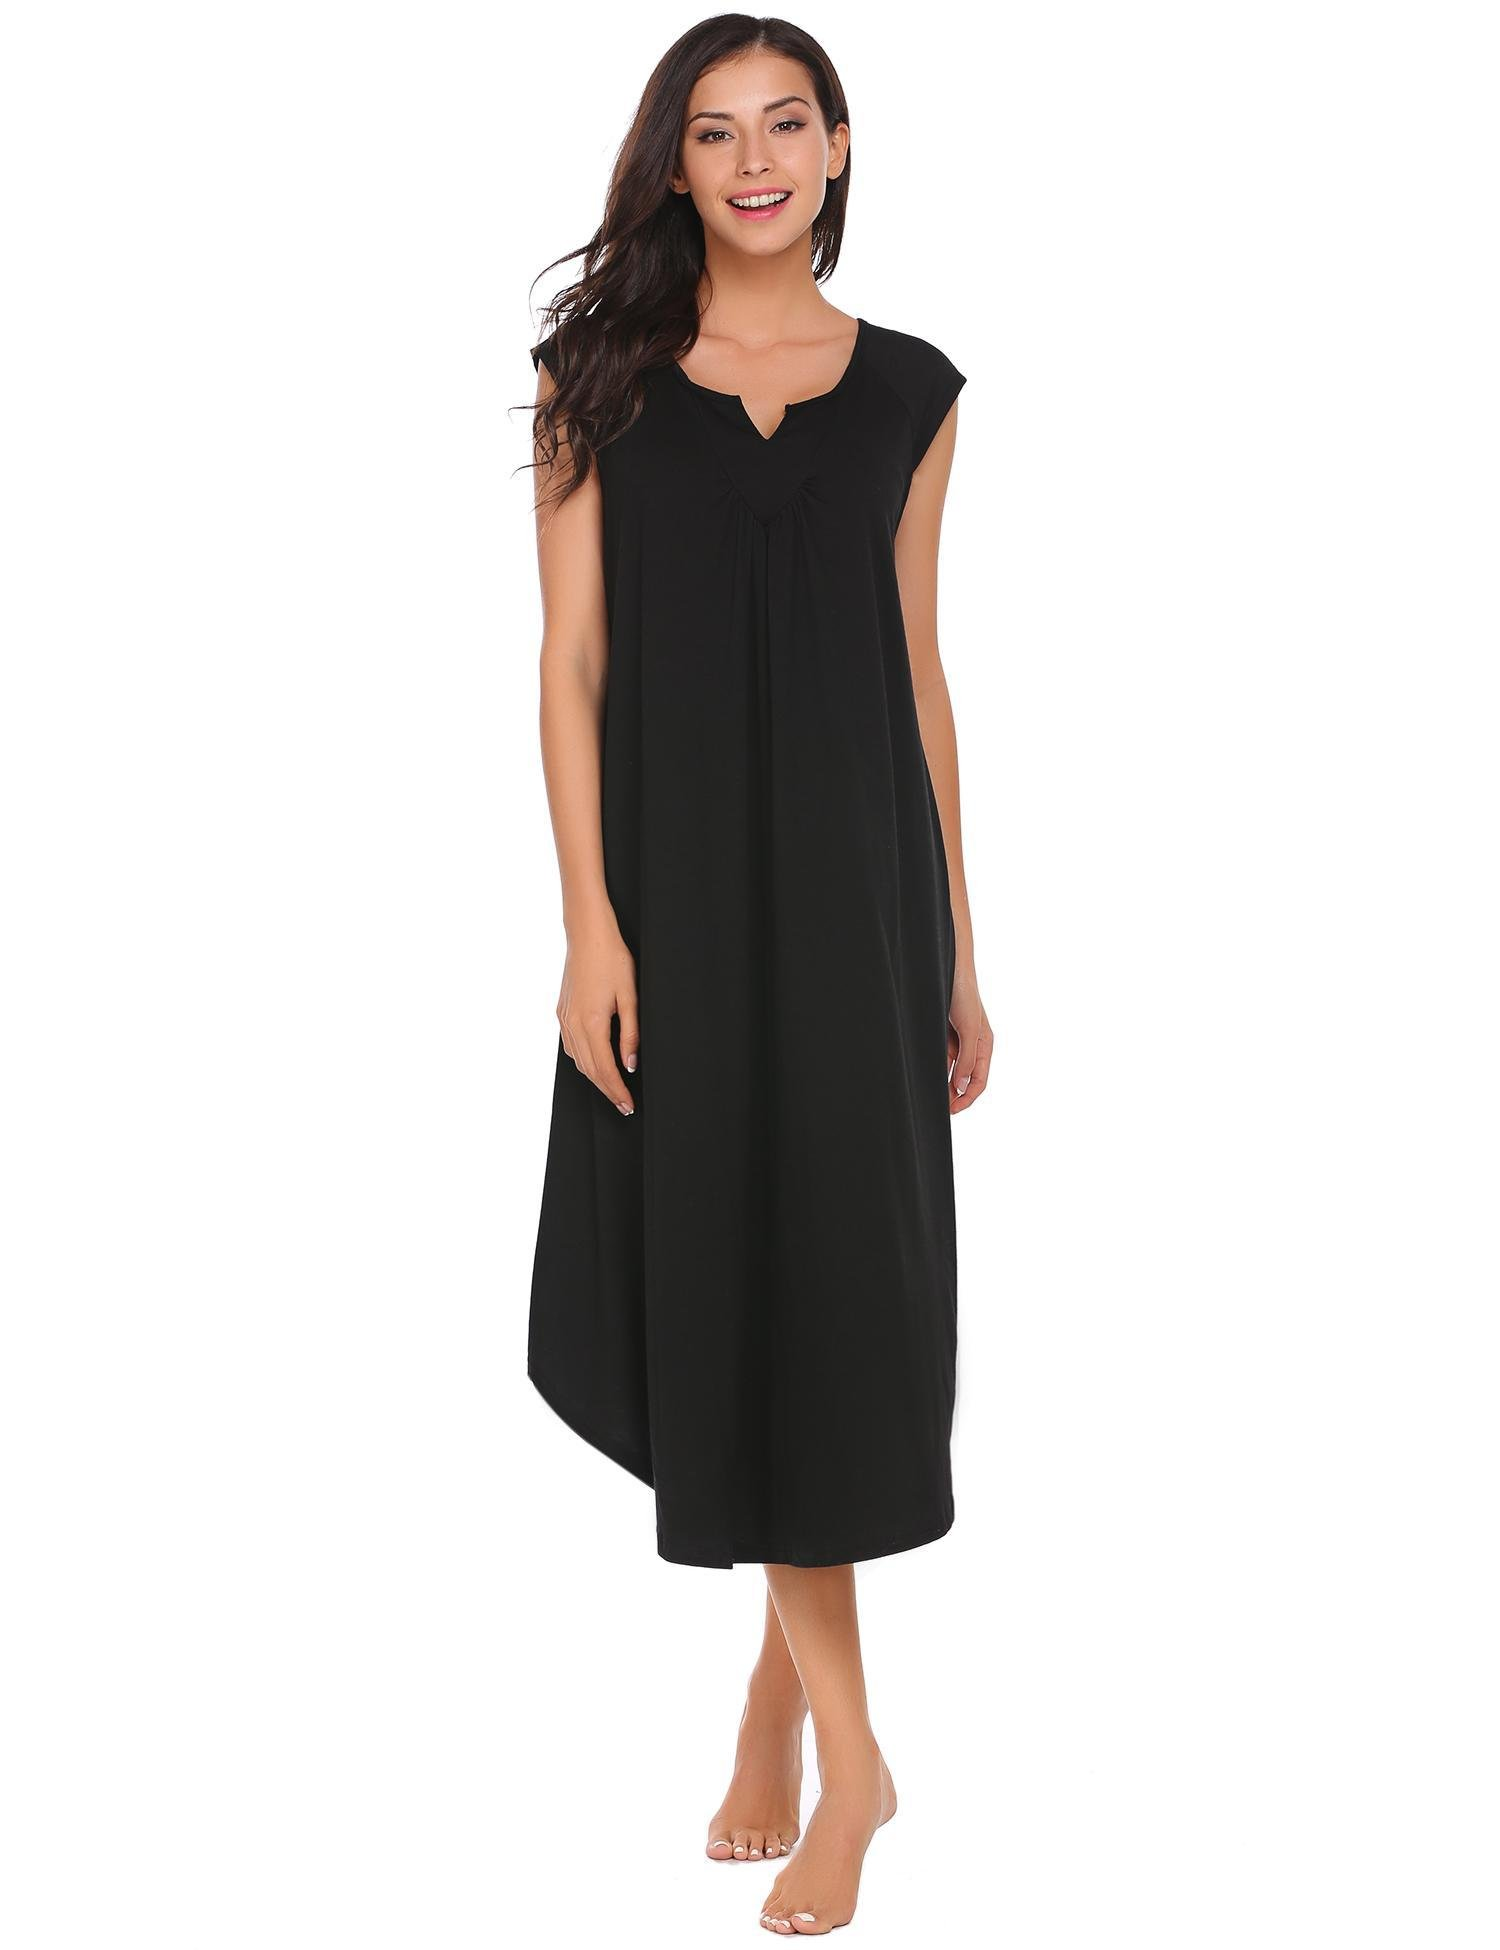 Ekouaer Womens Pajamas Lingerie V Neck Nightwear Sexy Cotton Sleepwear Babydoll Sleep dress, Black,